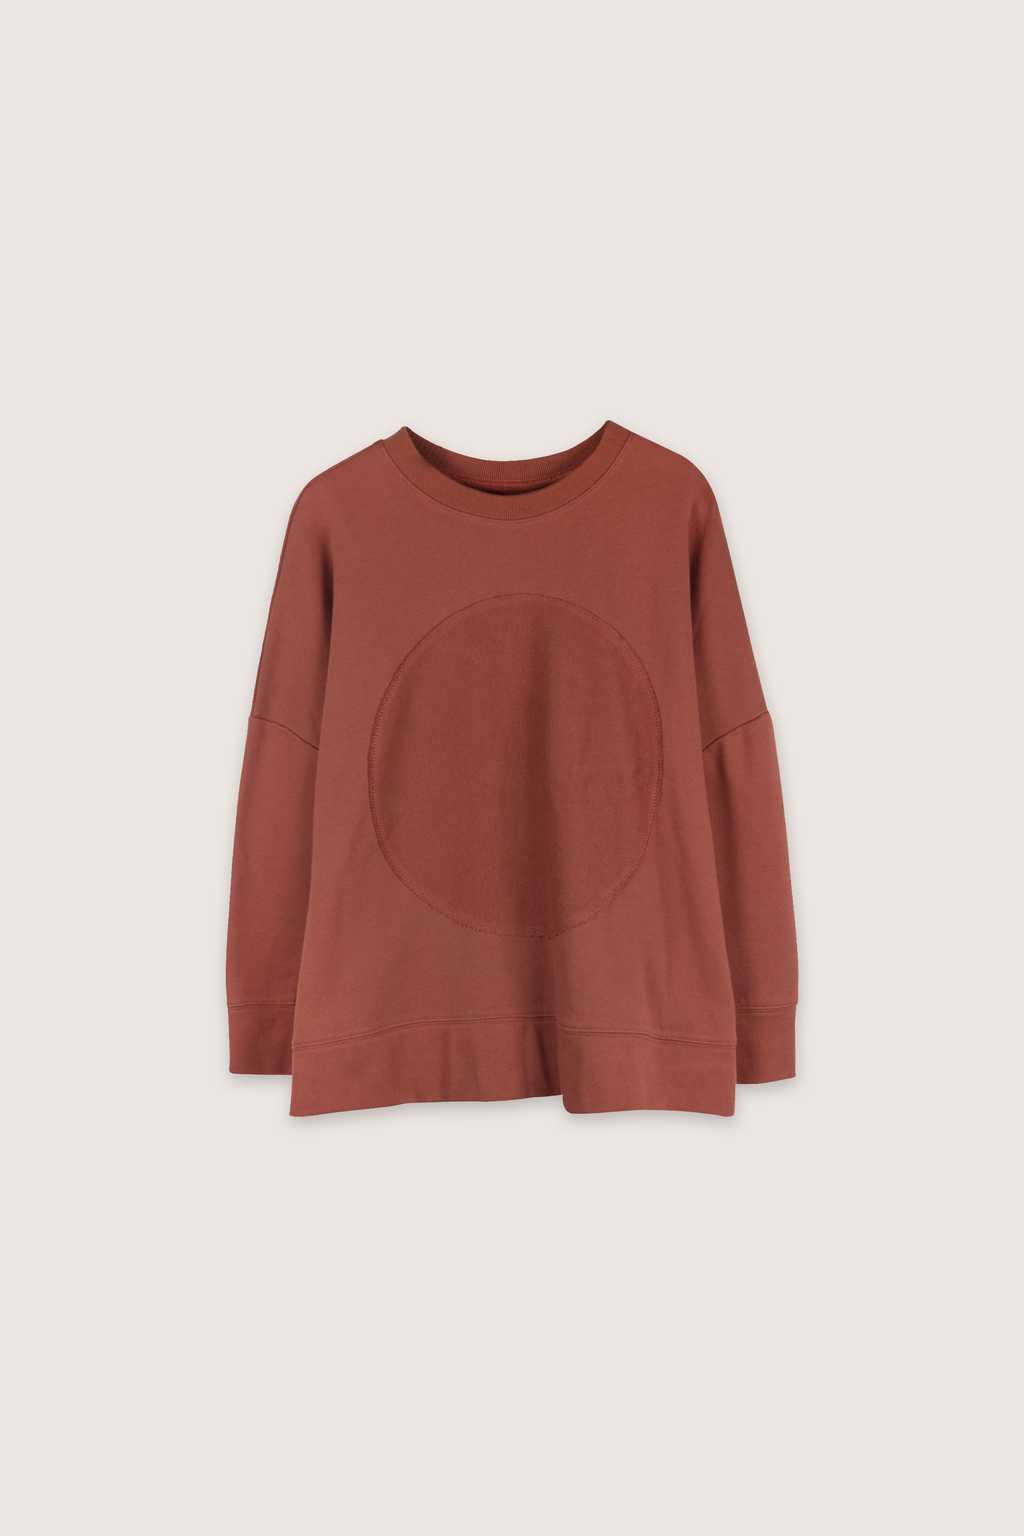 Sweatshirt 1521 Red 7